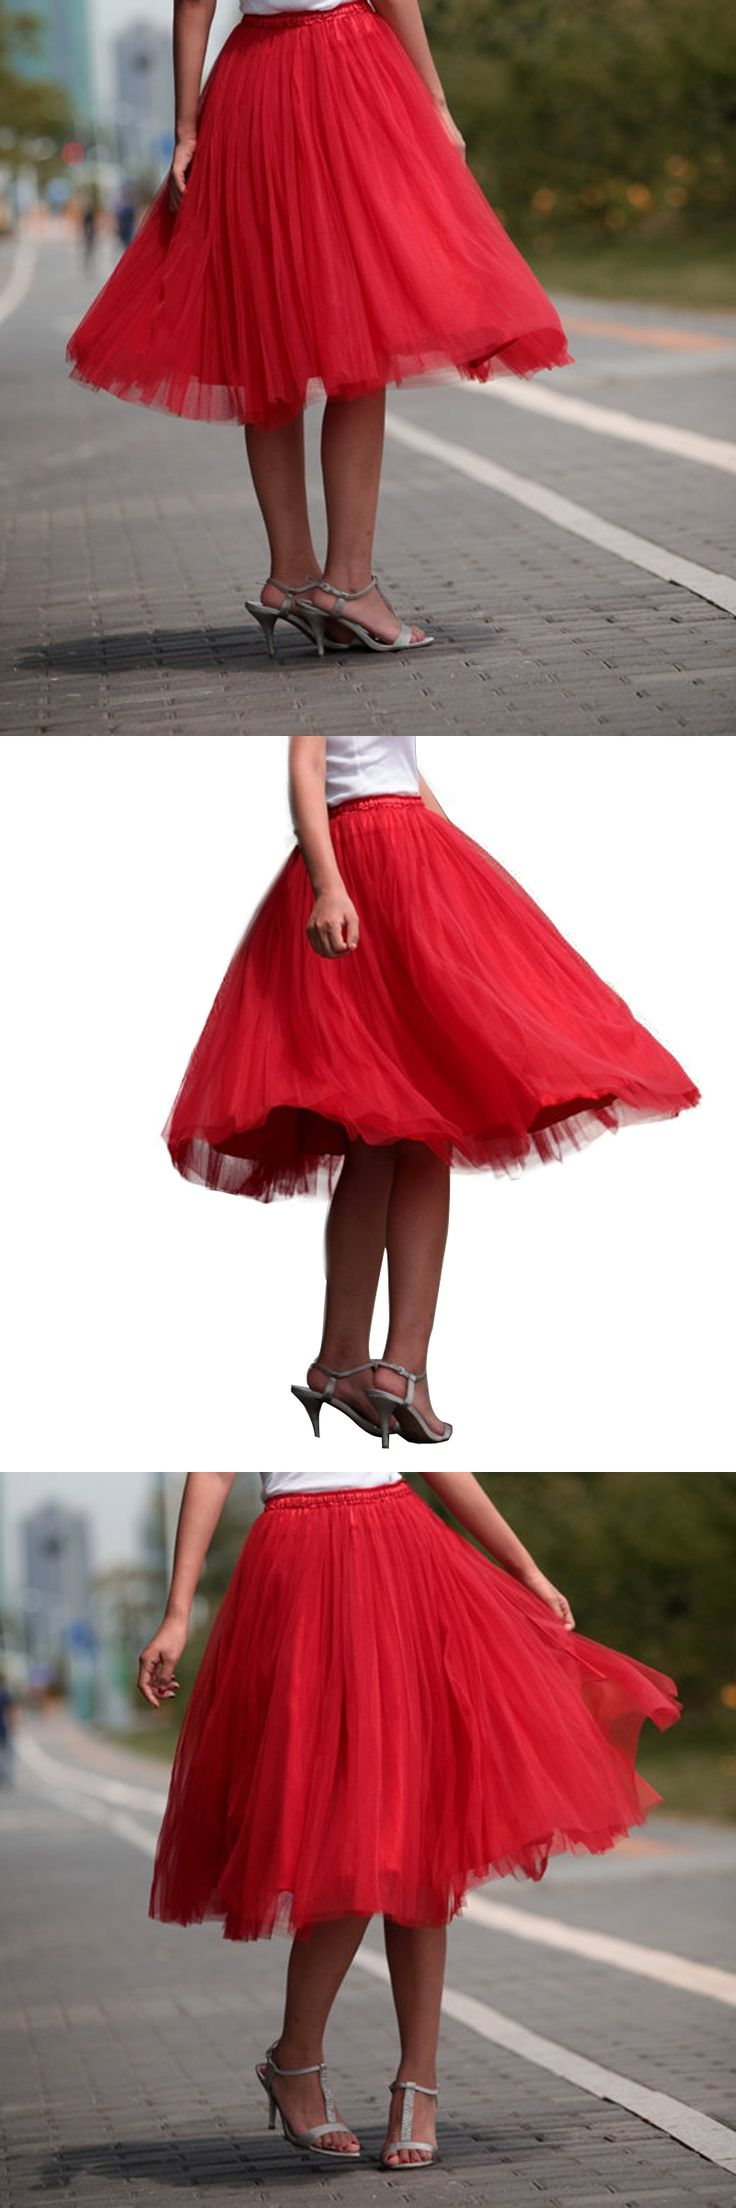 Red Tulle Skirt Girls Max Women Adult Tutu Skirts Knee Length Empire Boll Gowns For